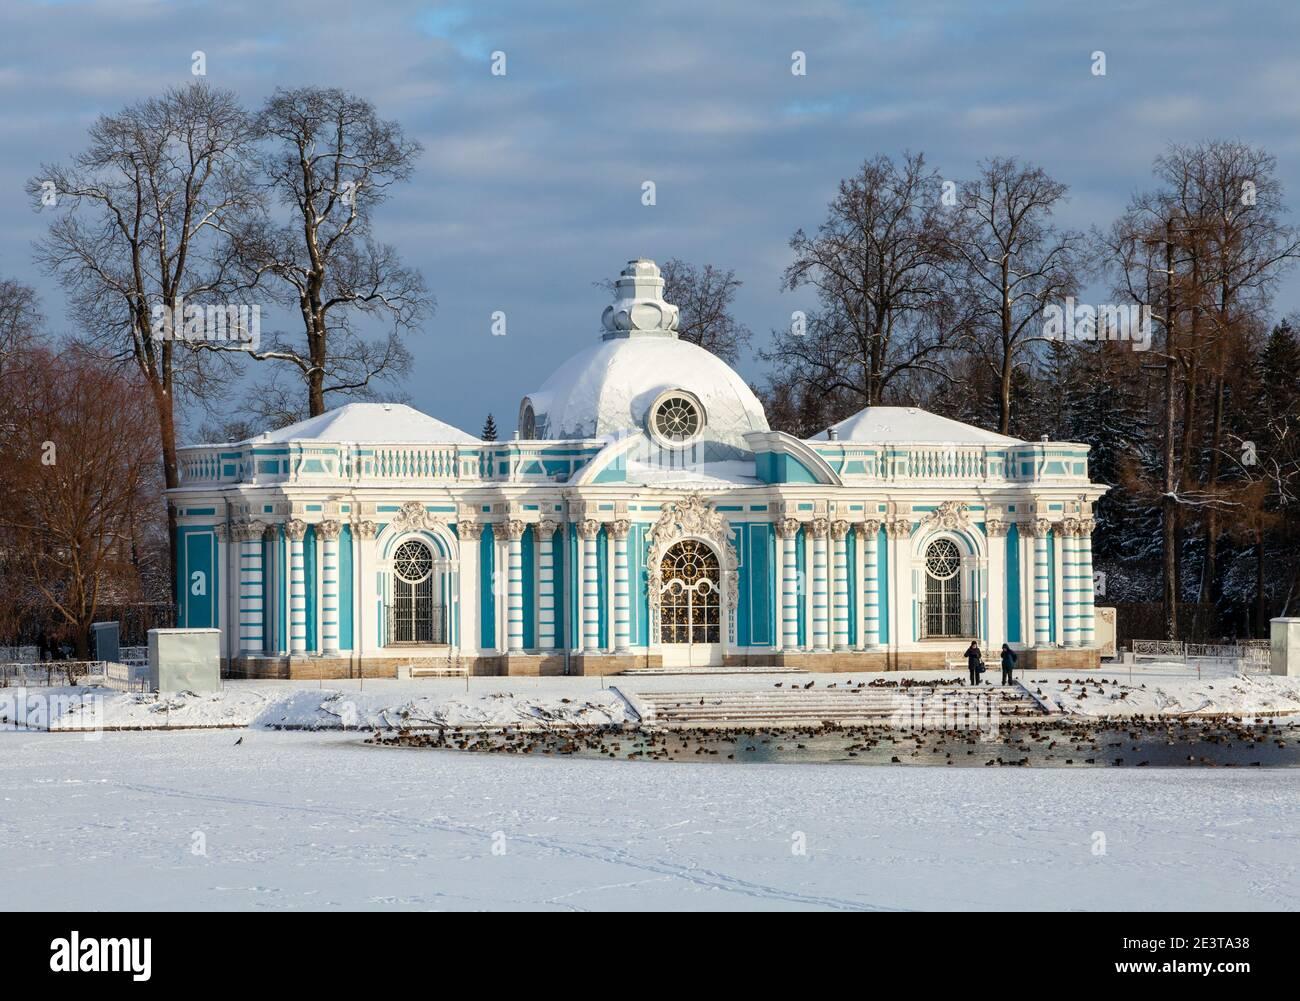 Grotto pavilion in Catherine Park, Tsarskoe Selo, Pushkin, St. Petersburg, Russia. Stock Photo